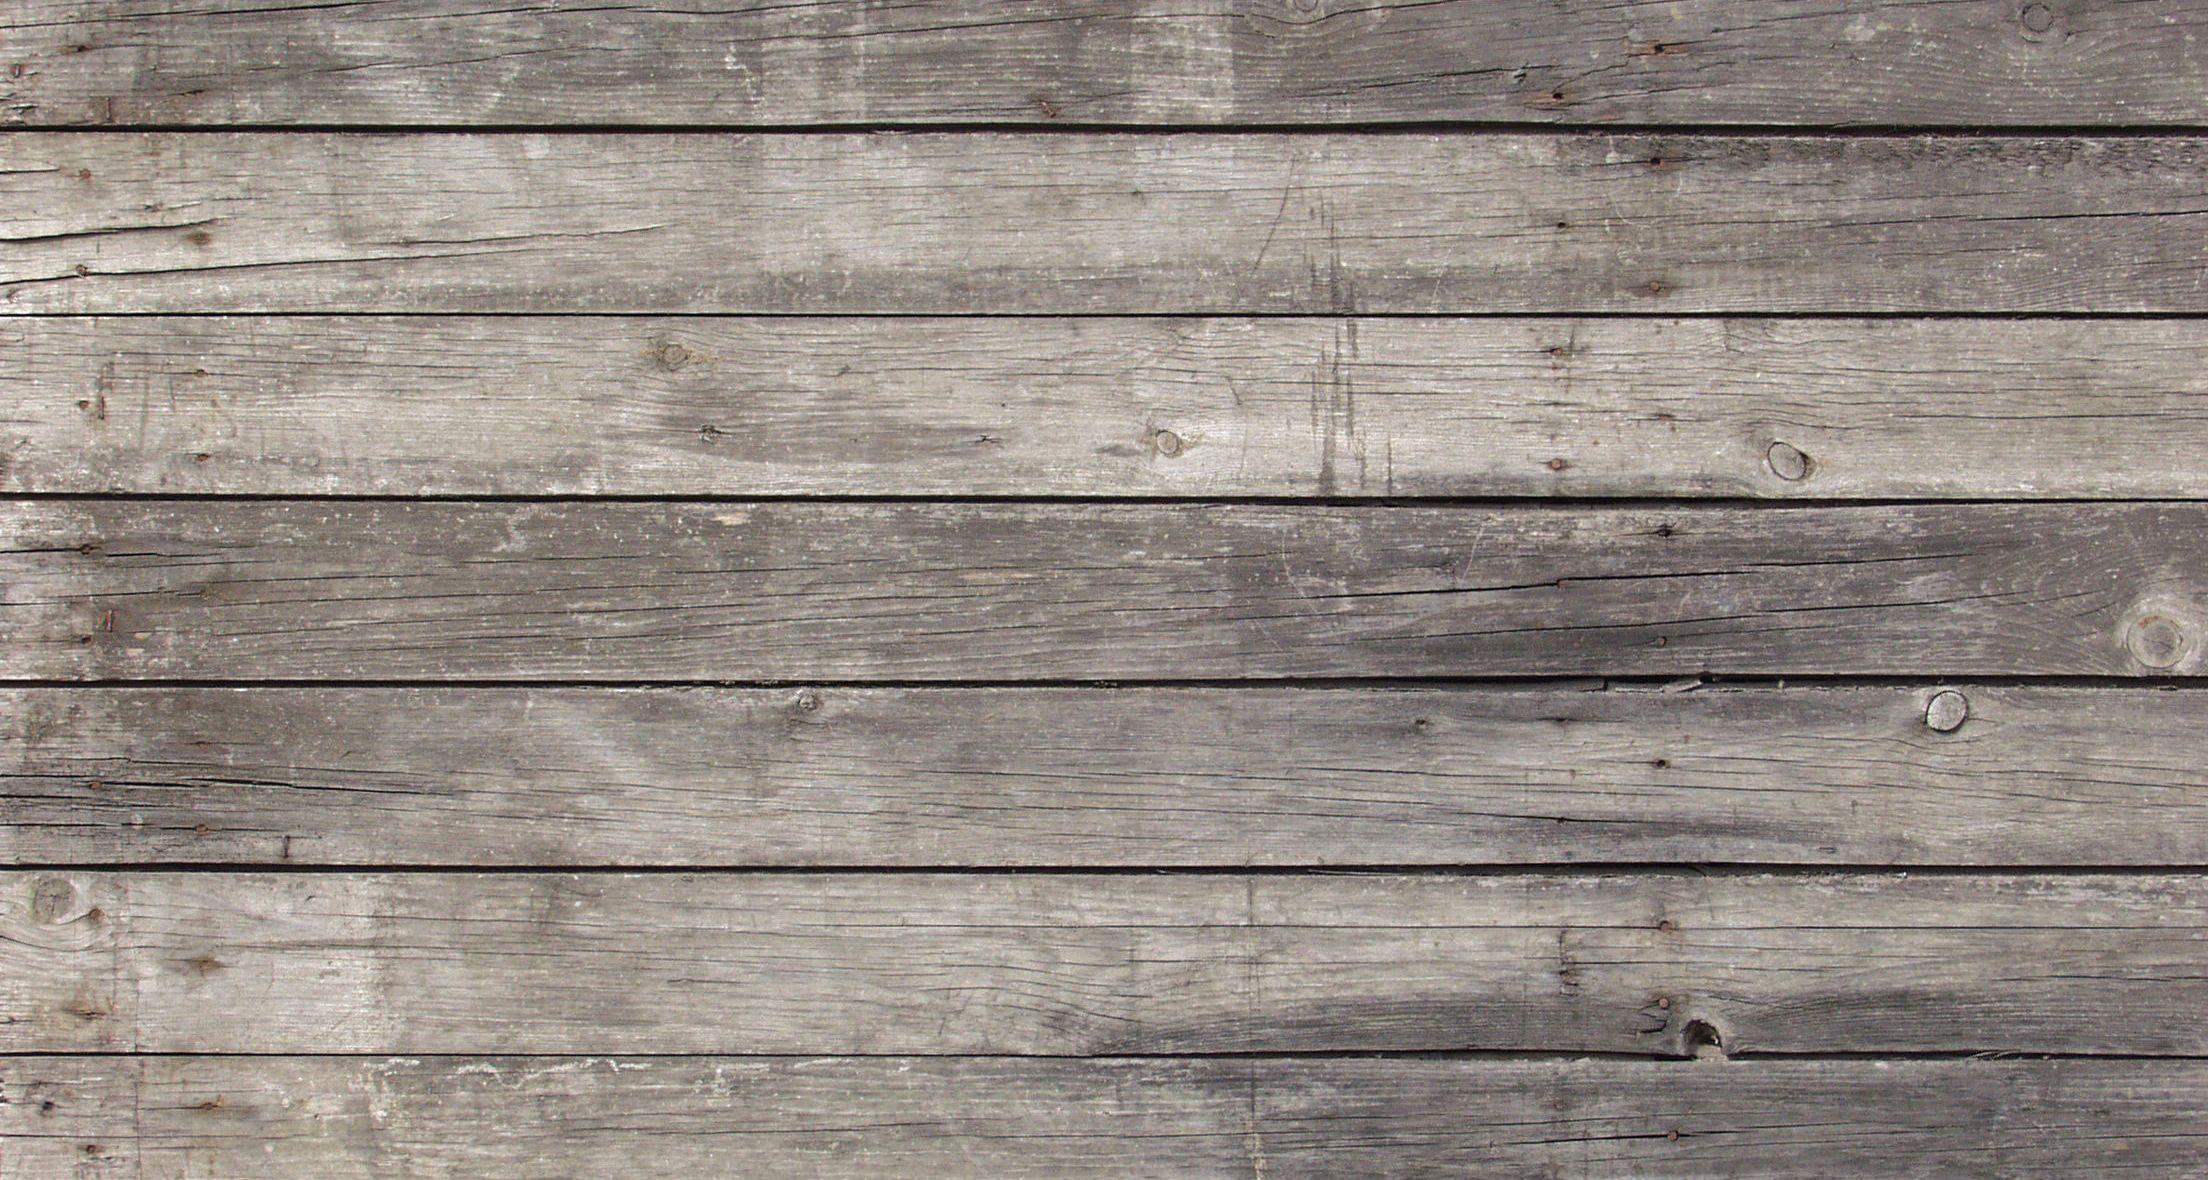 Download Texture Wooden Boards Texture Background Wood Wood Plank Texture Wooden Textures Wood Texture